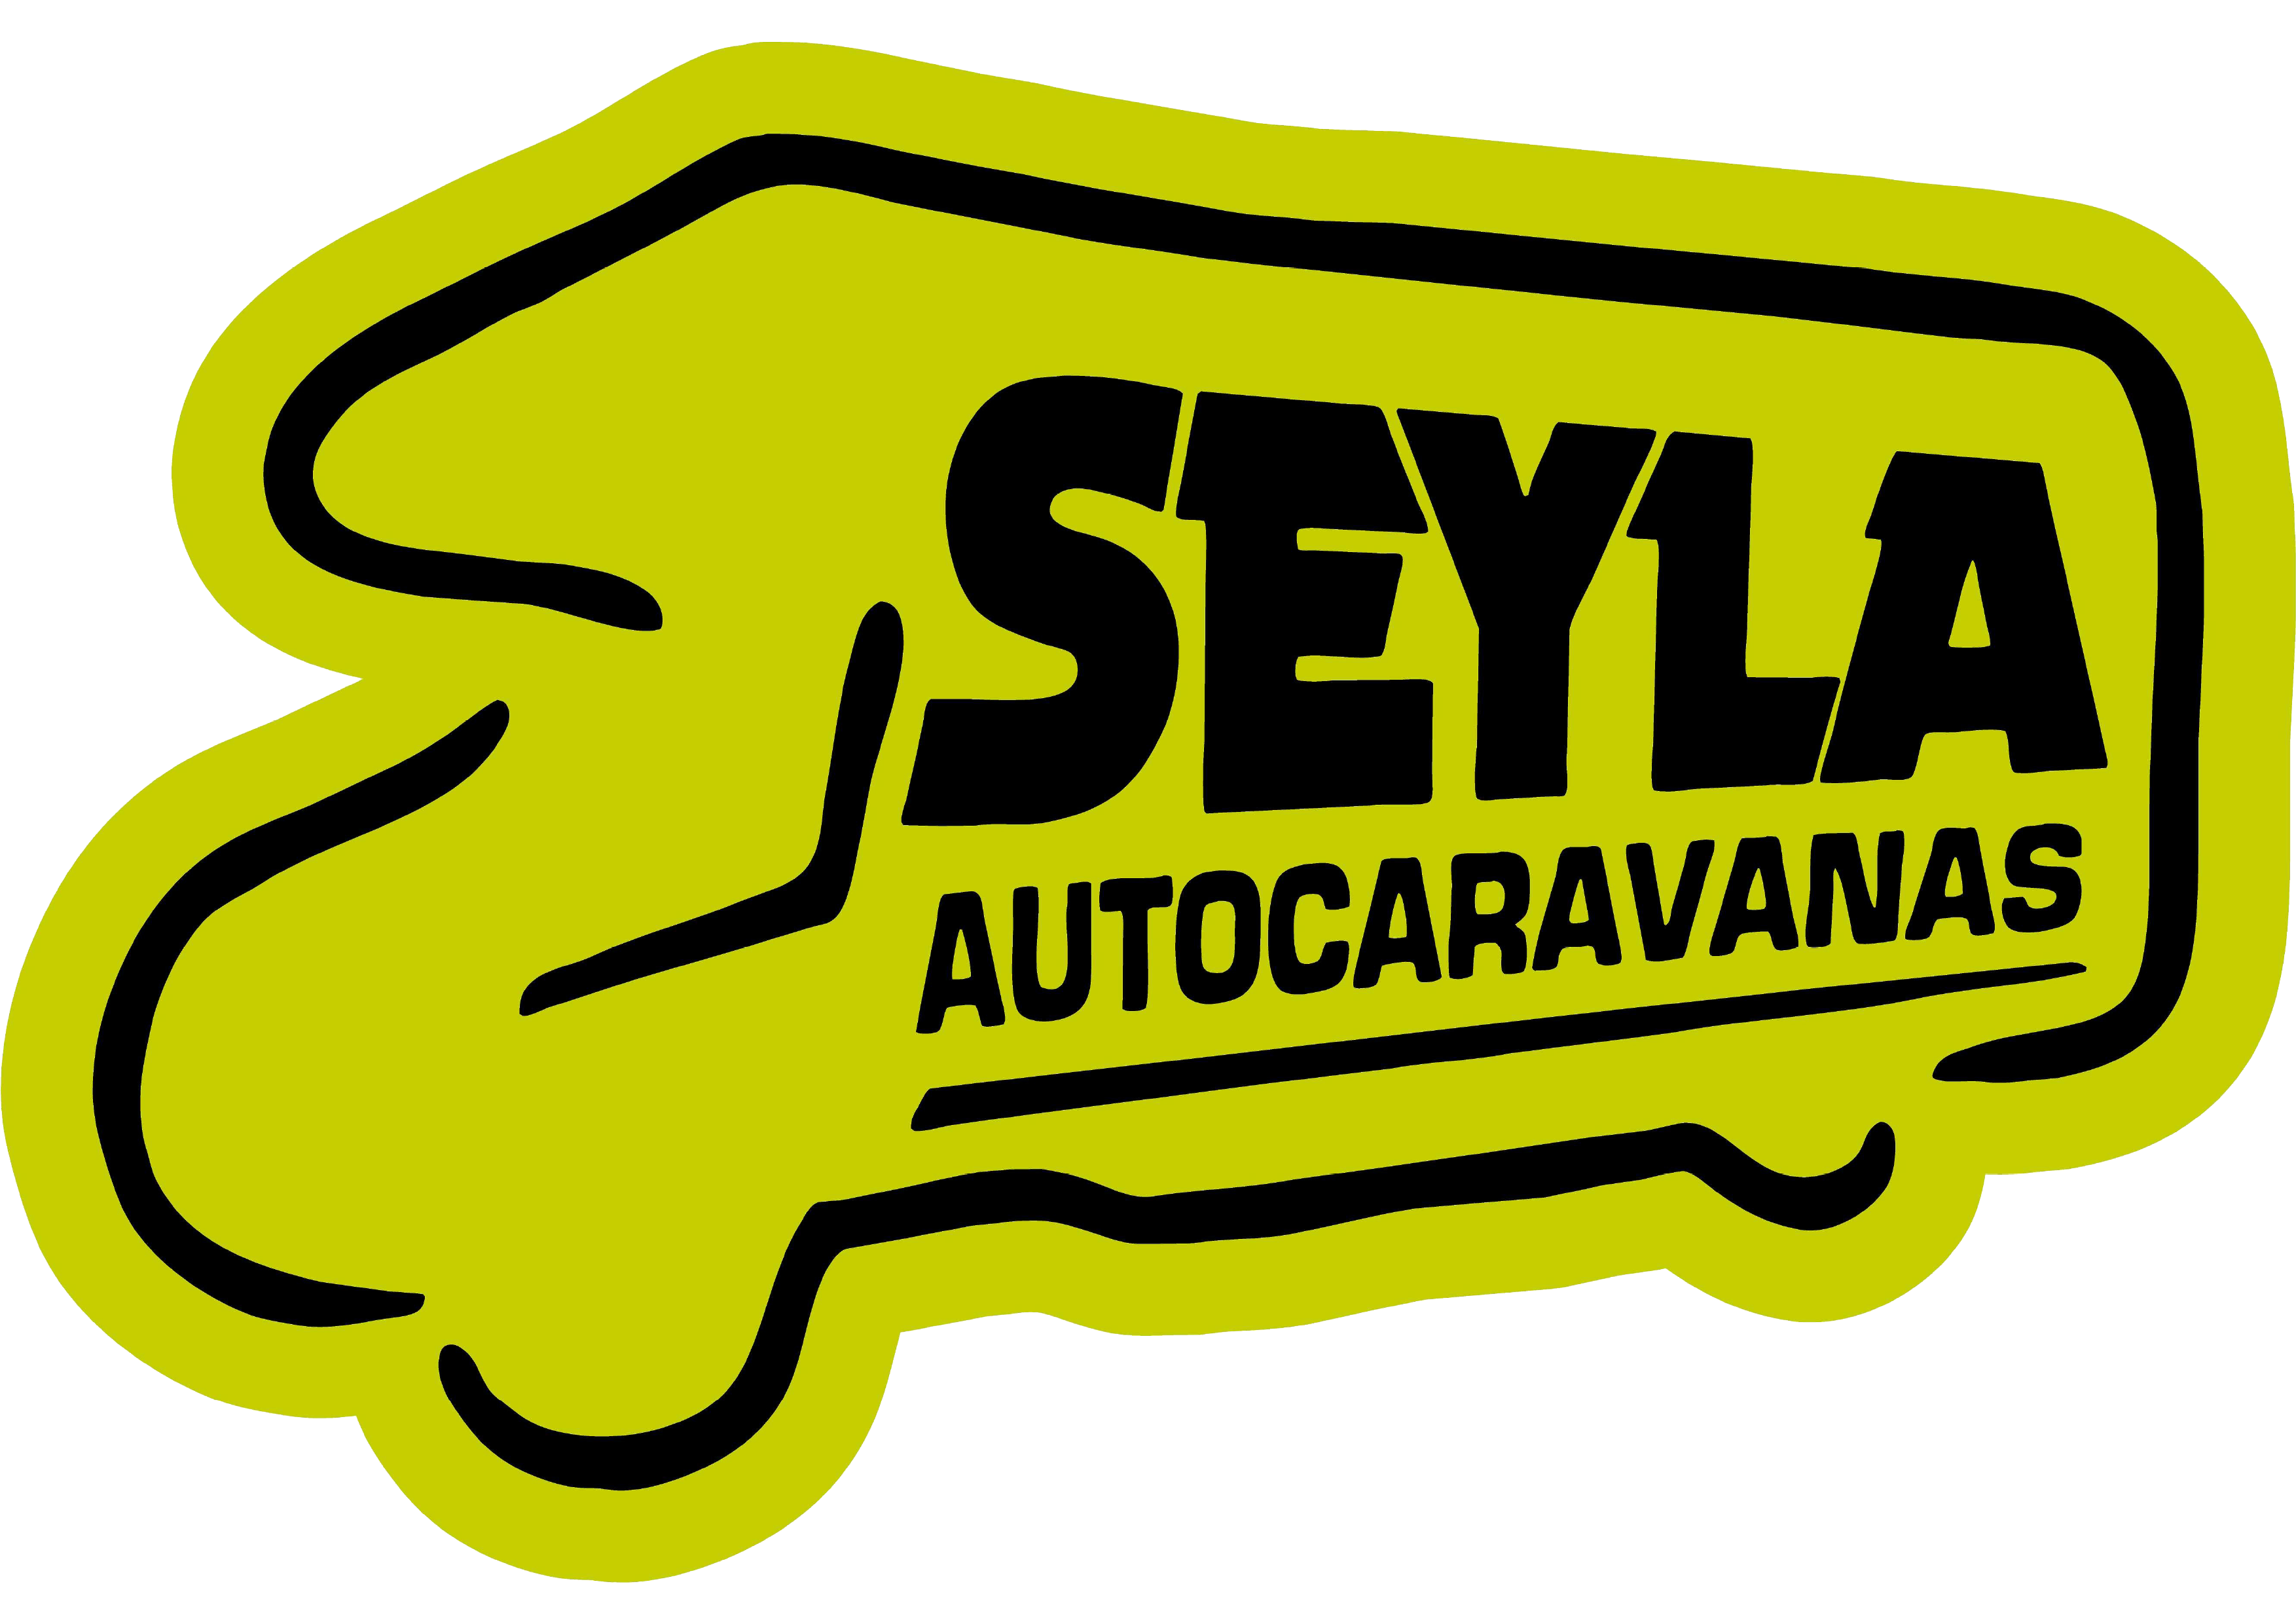 Autocaravanas Seyla